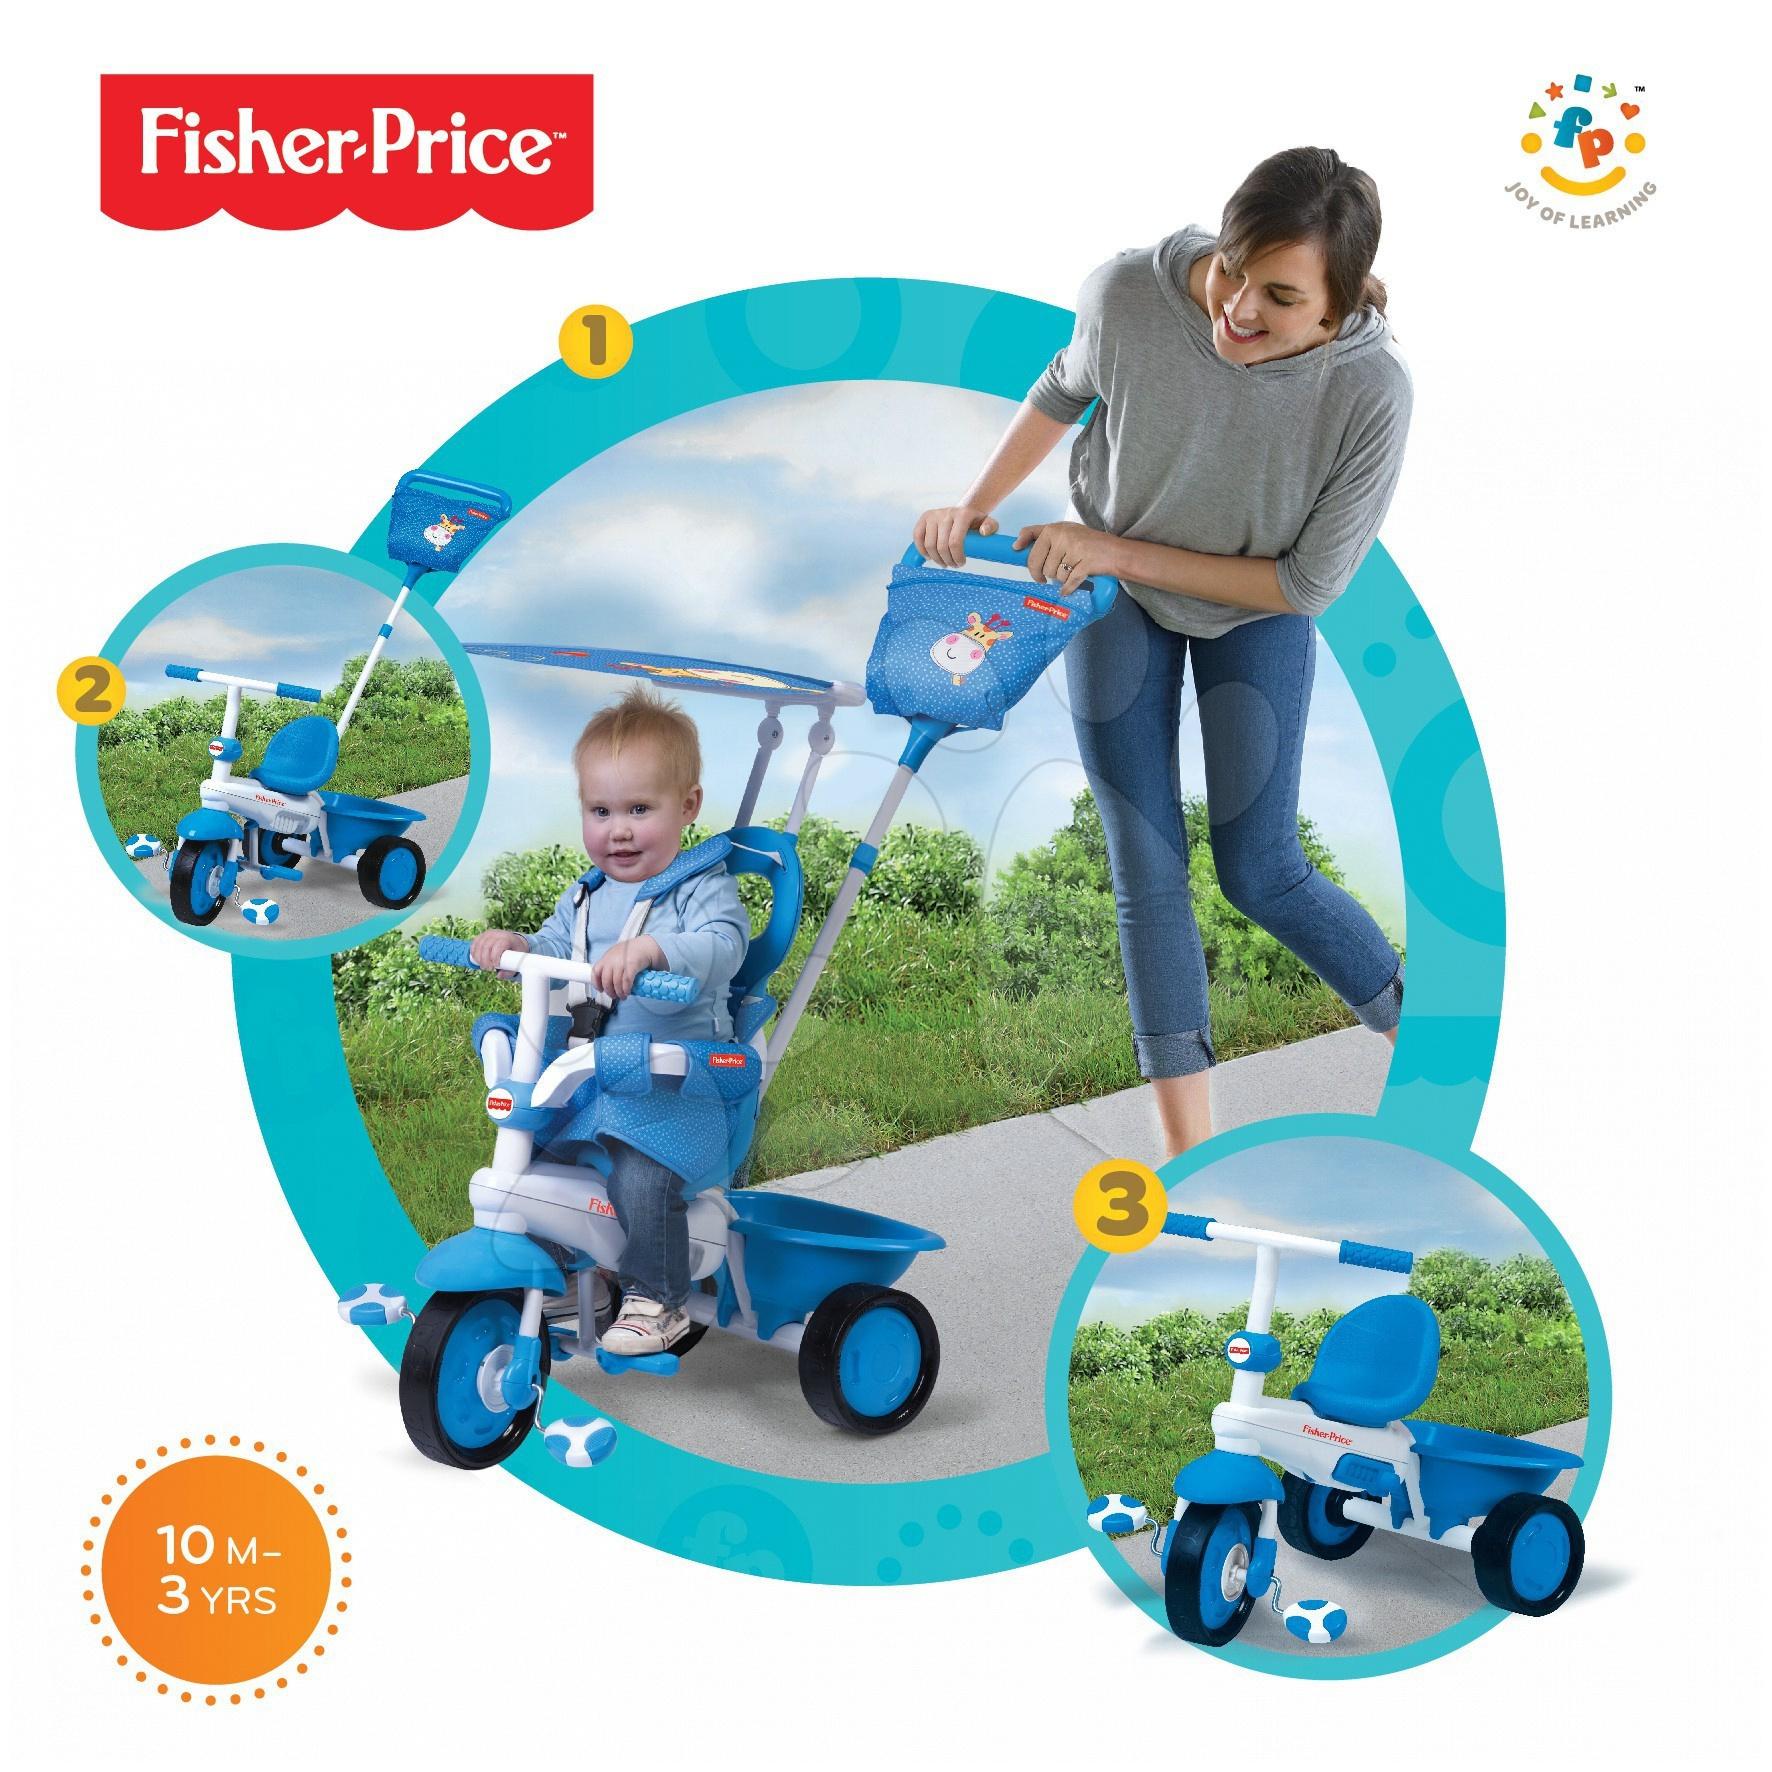 Trojkolka Fisher-Price Elite smarTrike modrá od 10 mes